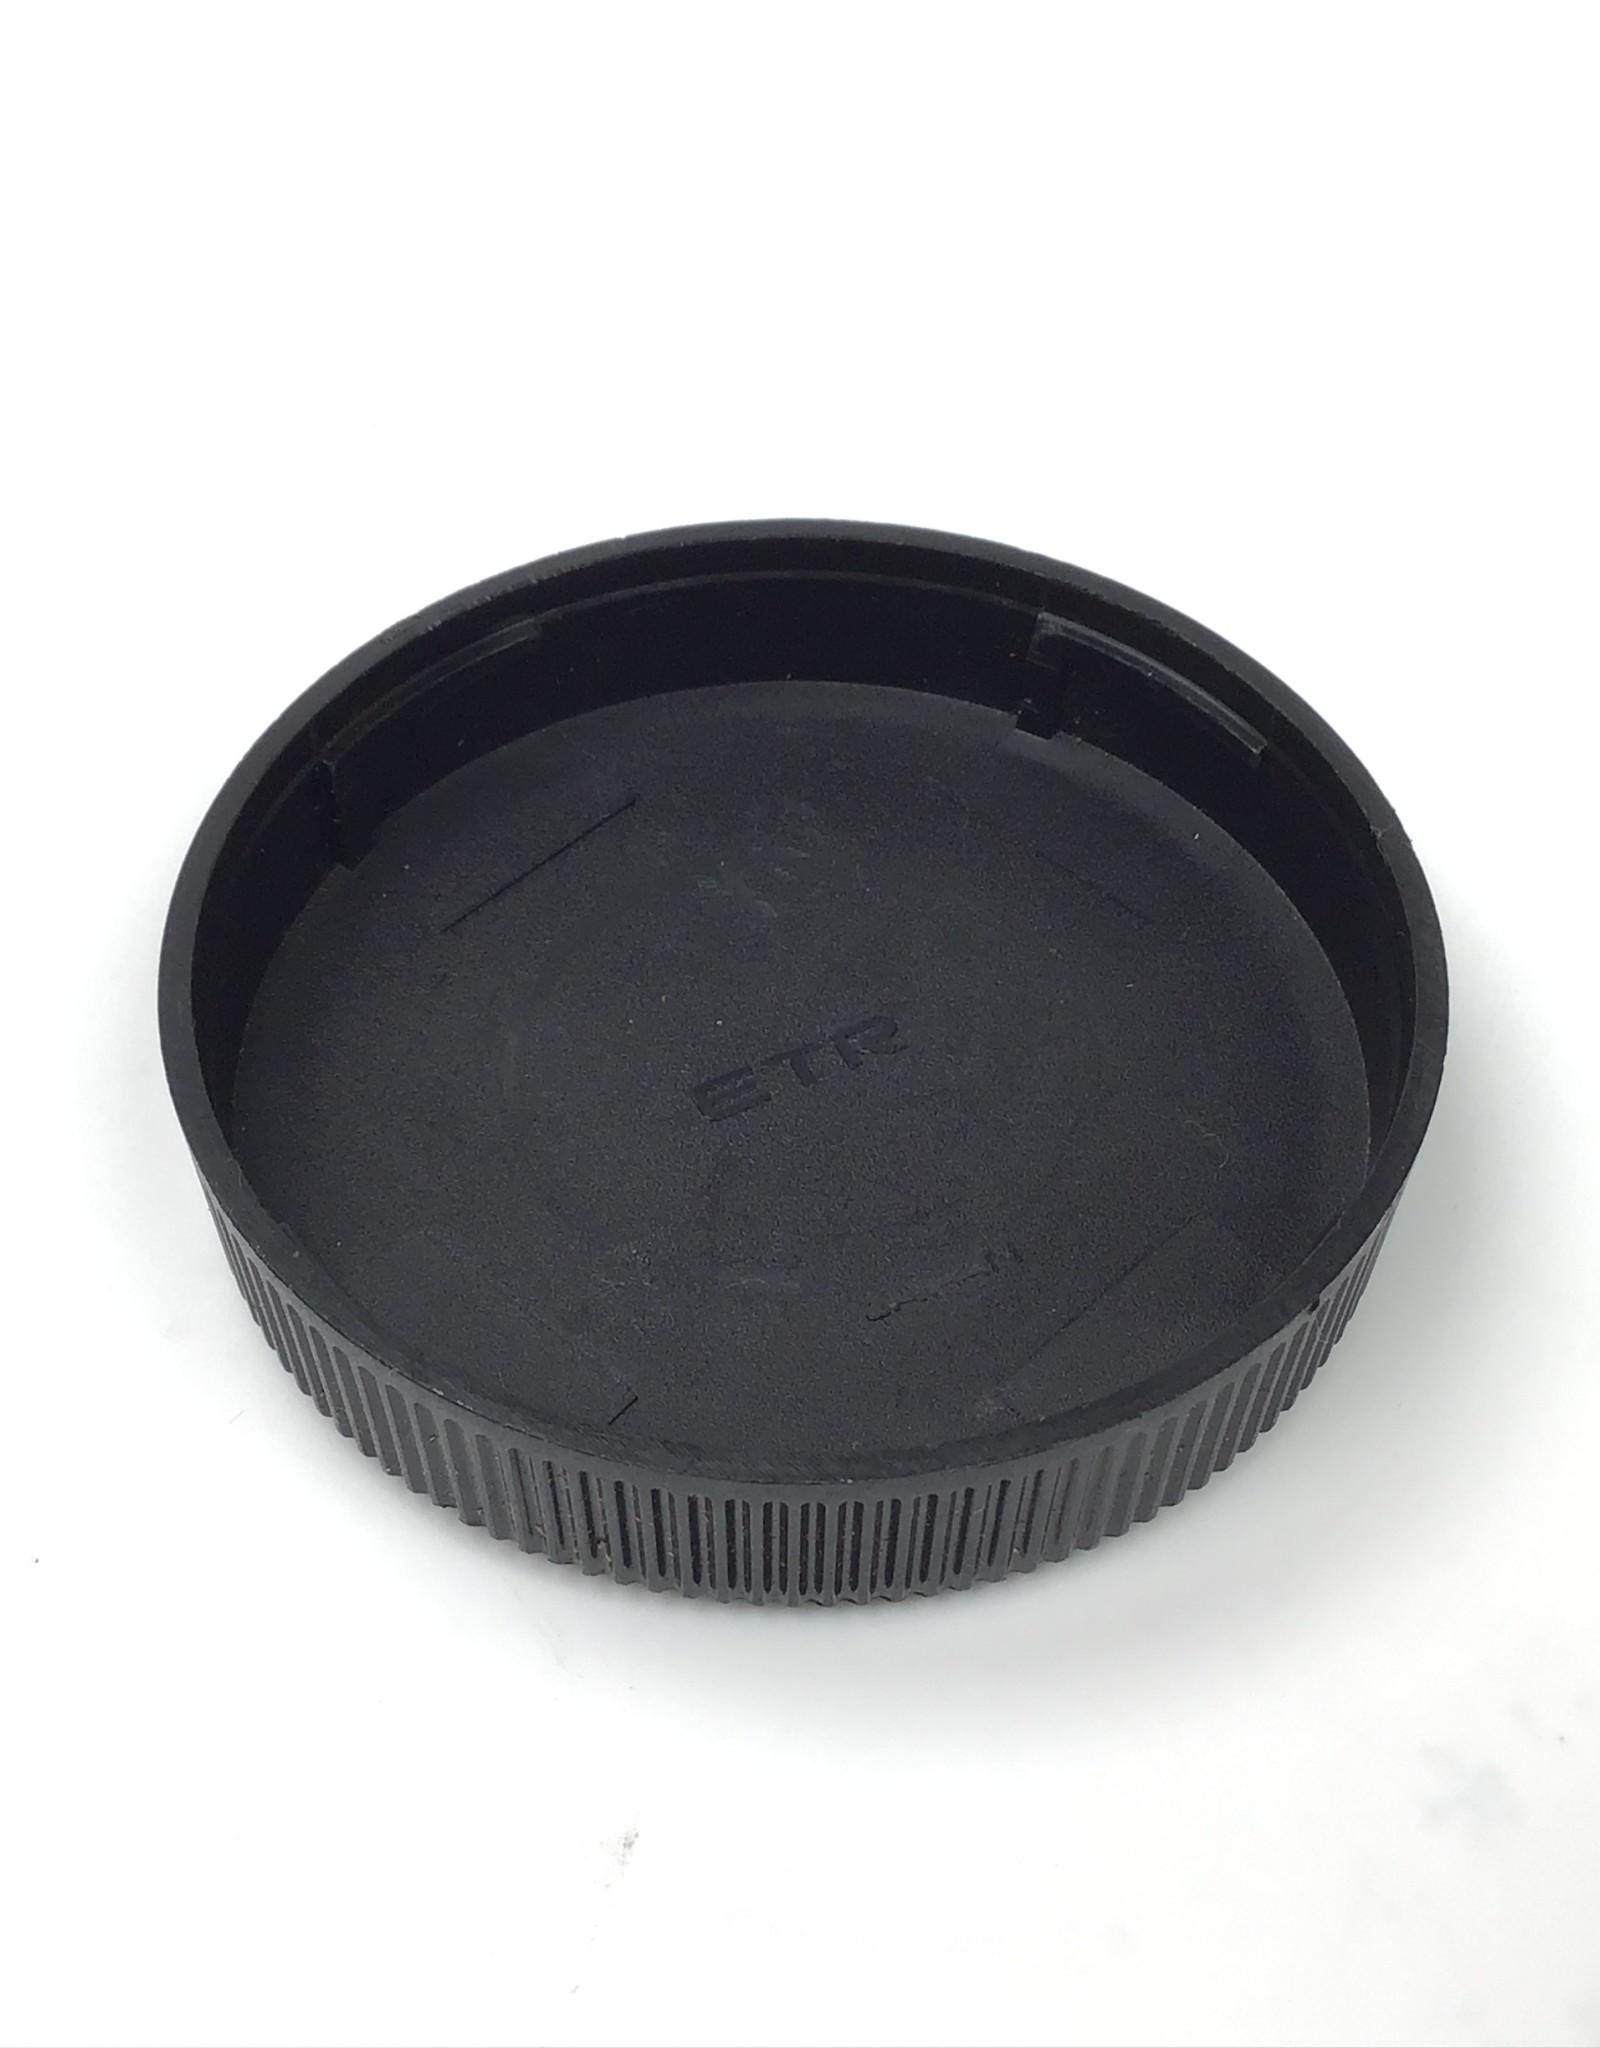 Bronica Bronica SQ Rear Lens Cap Used EX